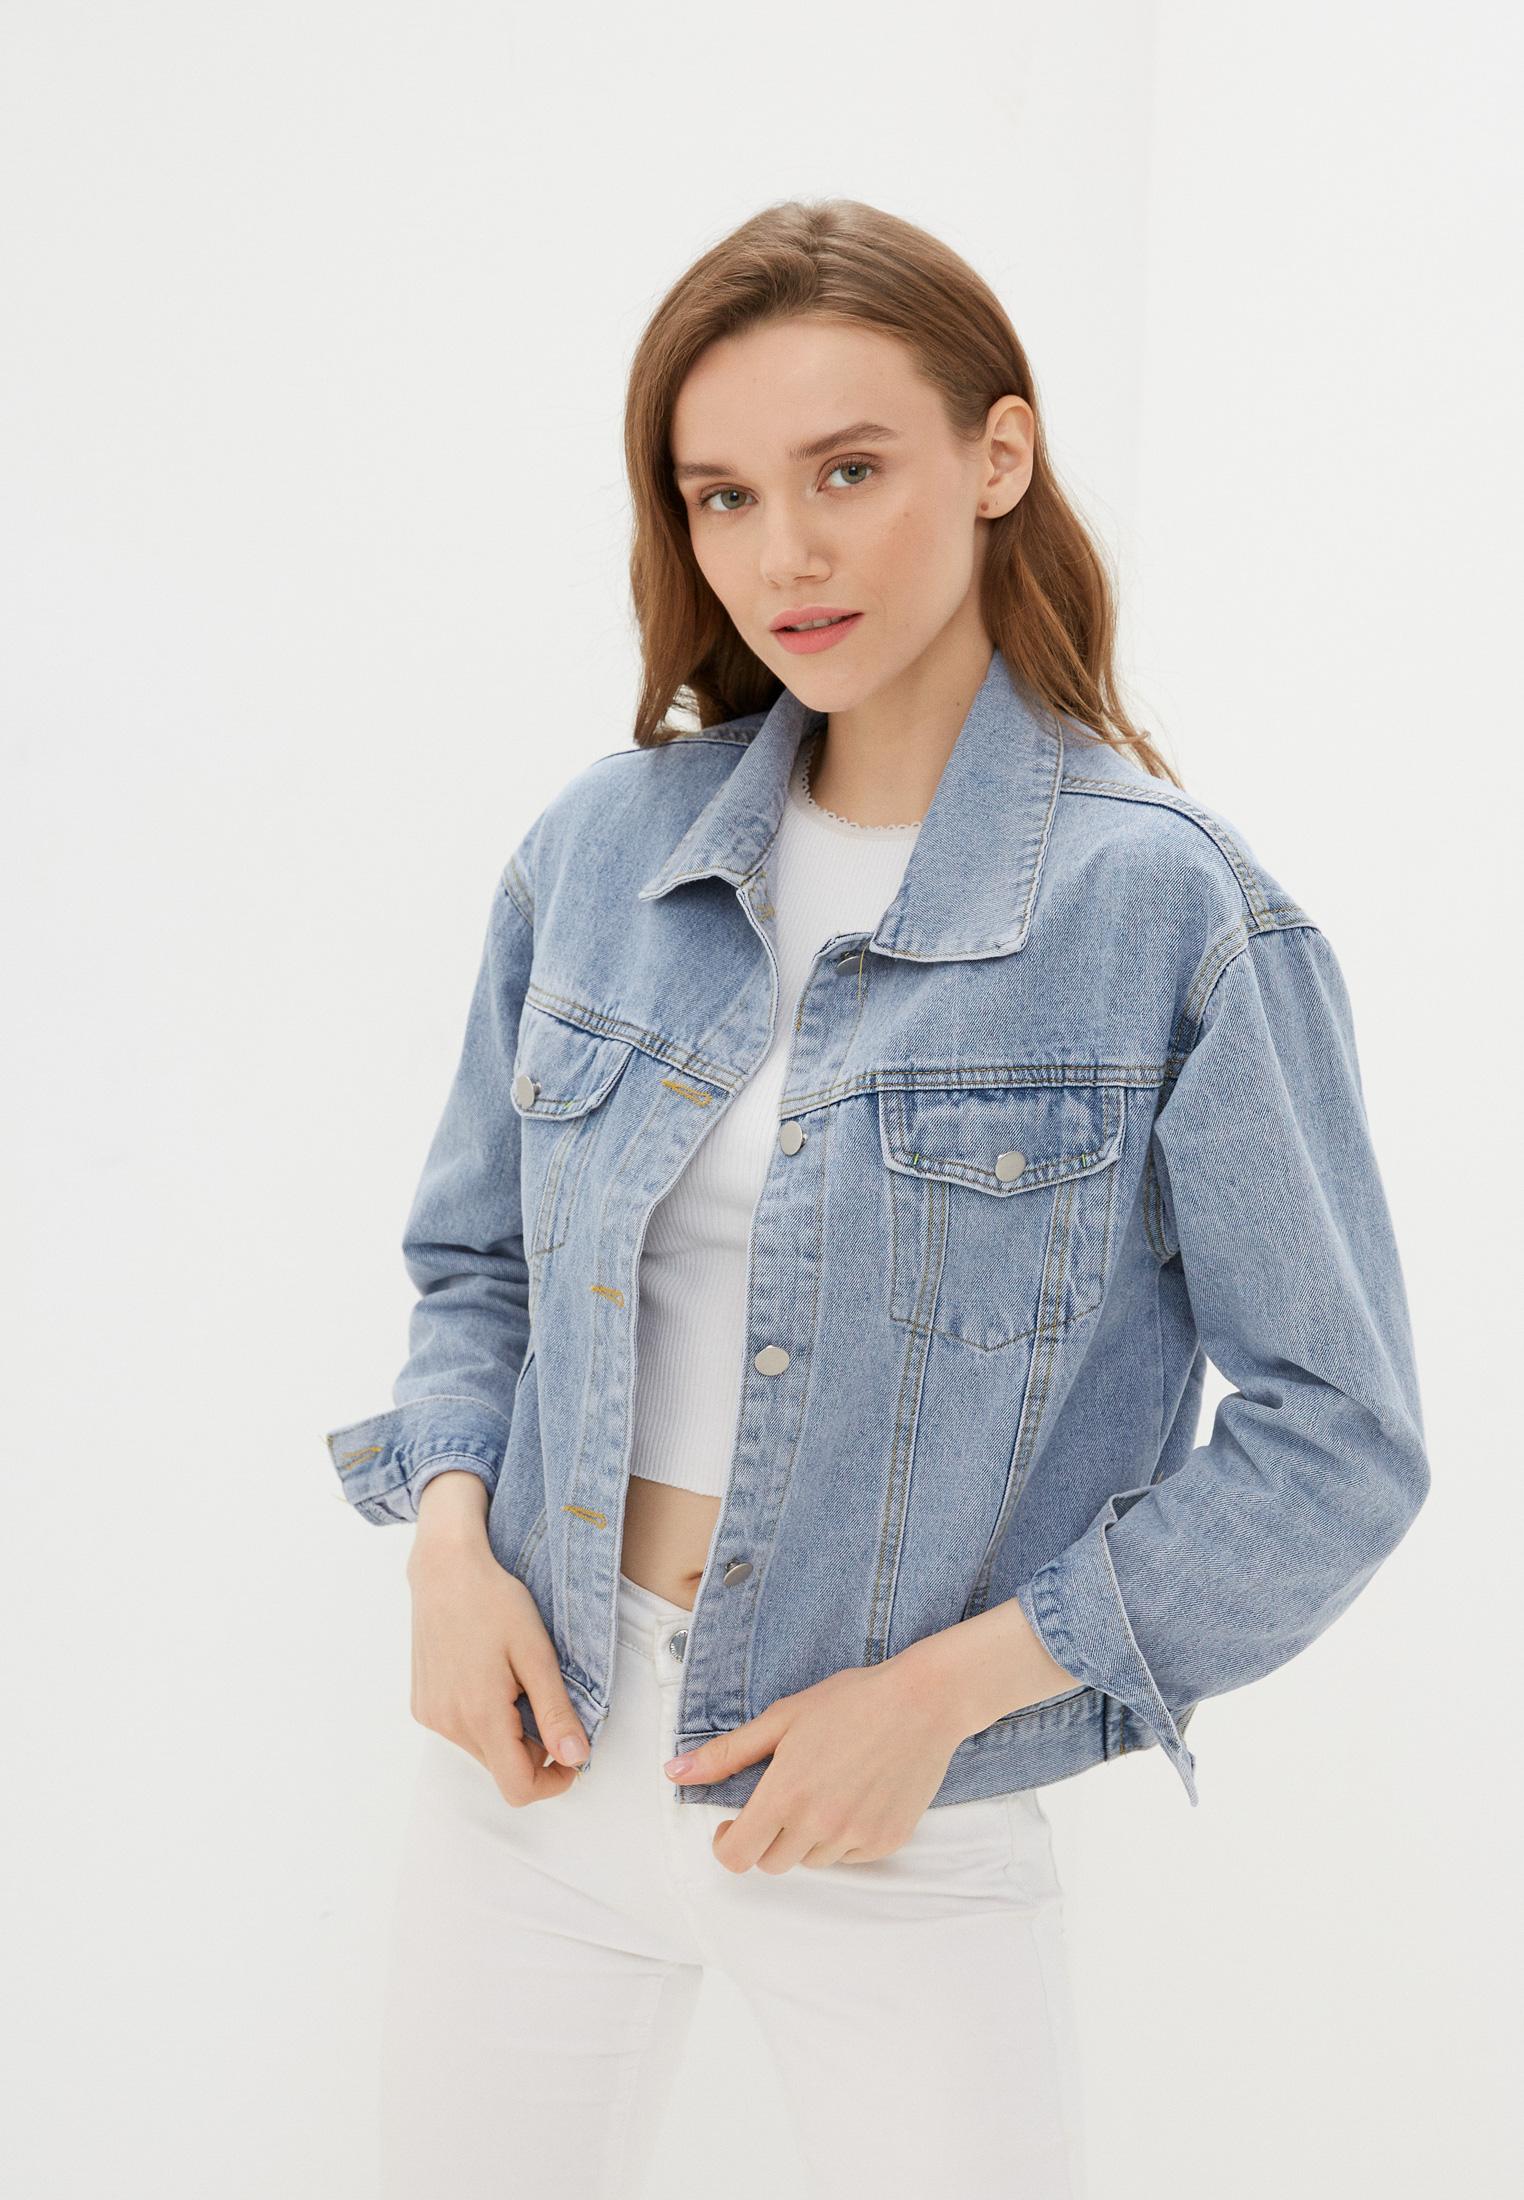 Джинсовая куртка Miss Gabby 10587